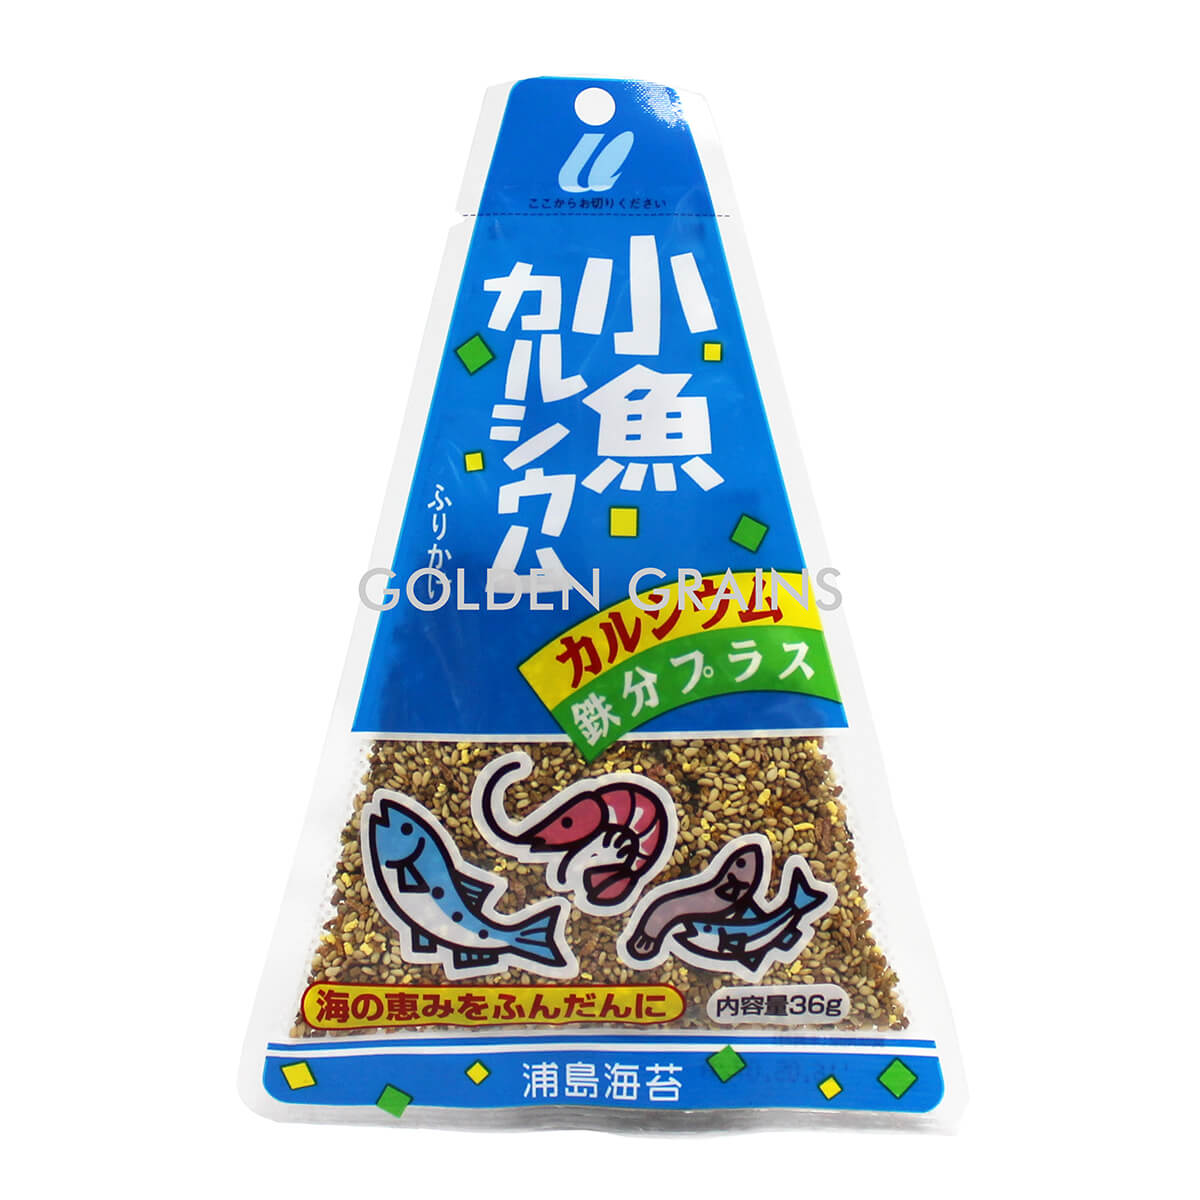 Golden Grains Sankaku - Front.jpg